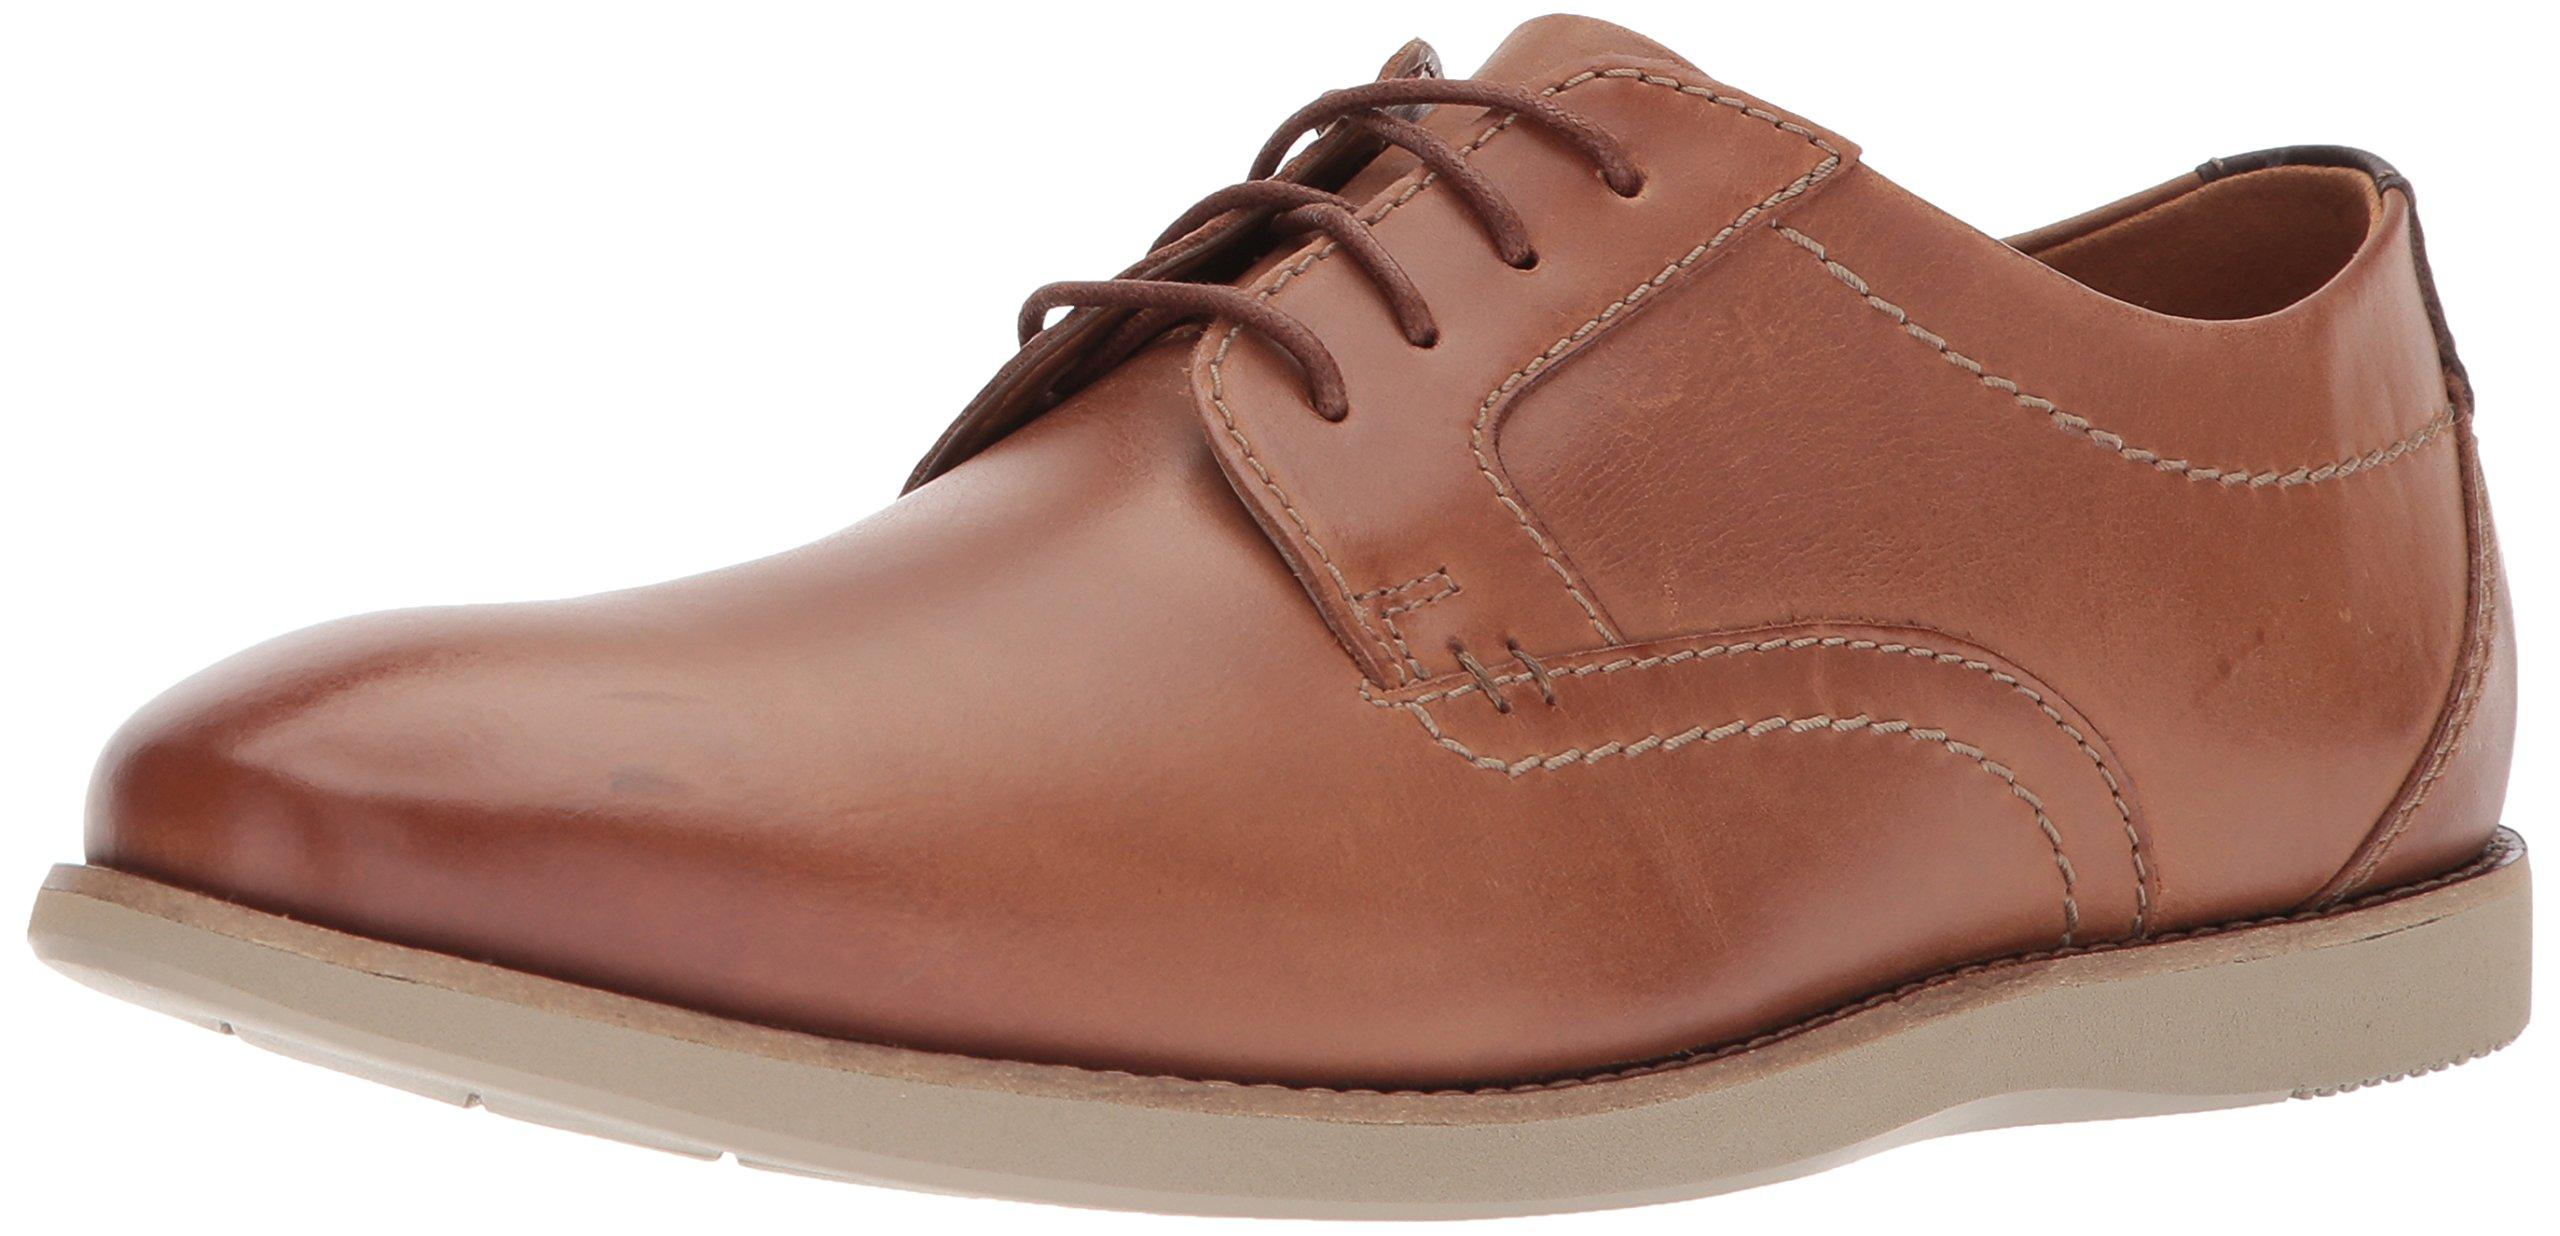 CLARKS Men's Raharto Plain Oxford, Dark Tan Leather, 8.5 Medium US